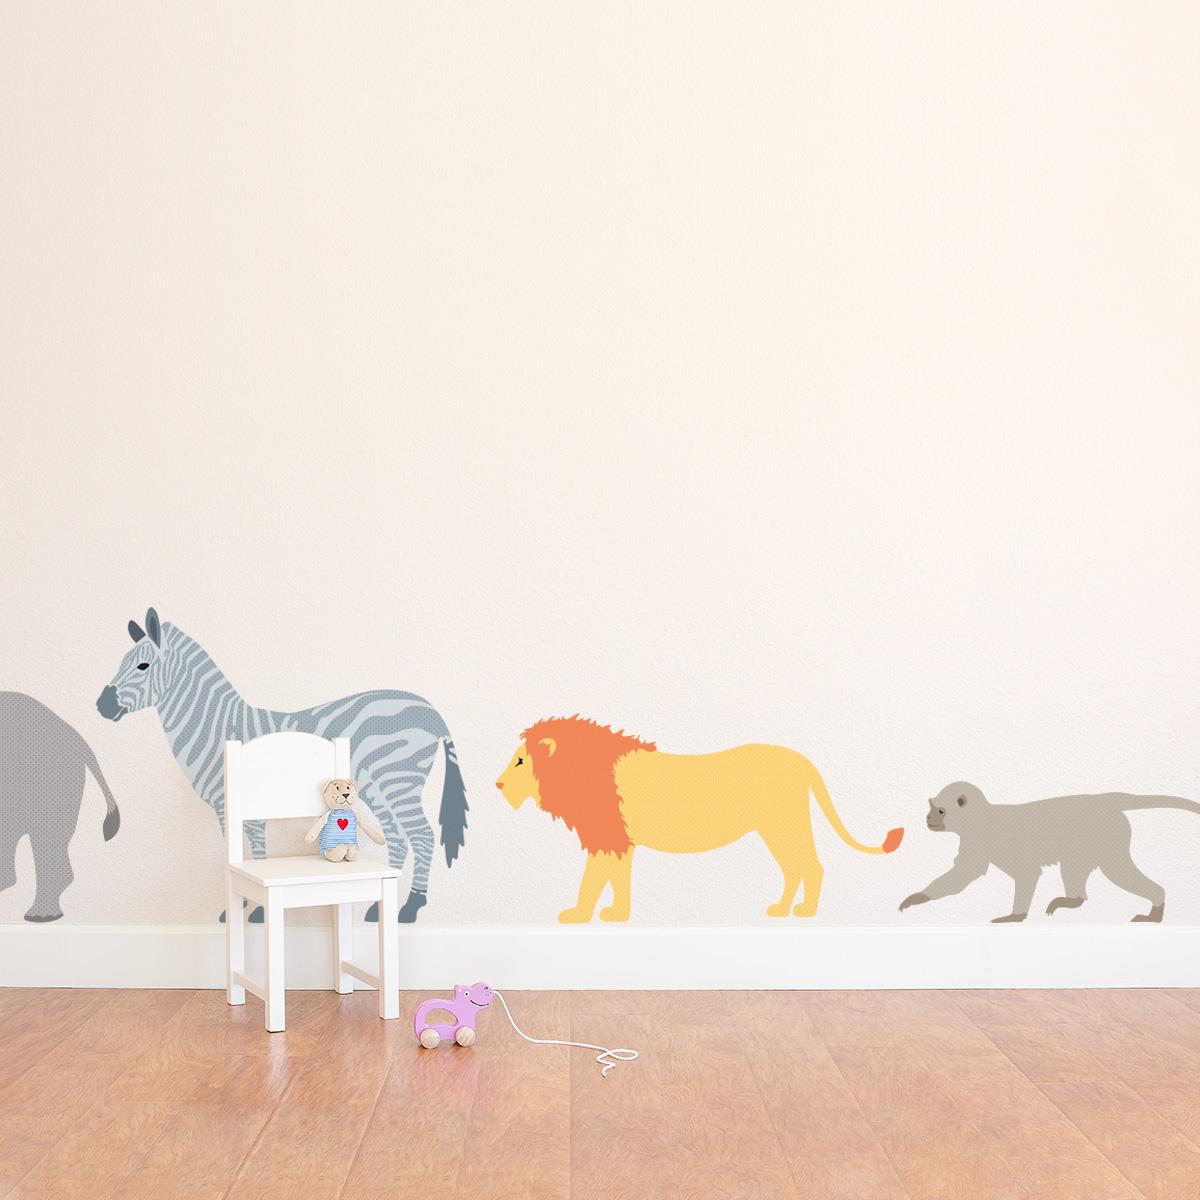 patterned safari animals printed wall decal set